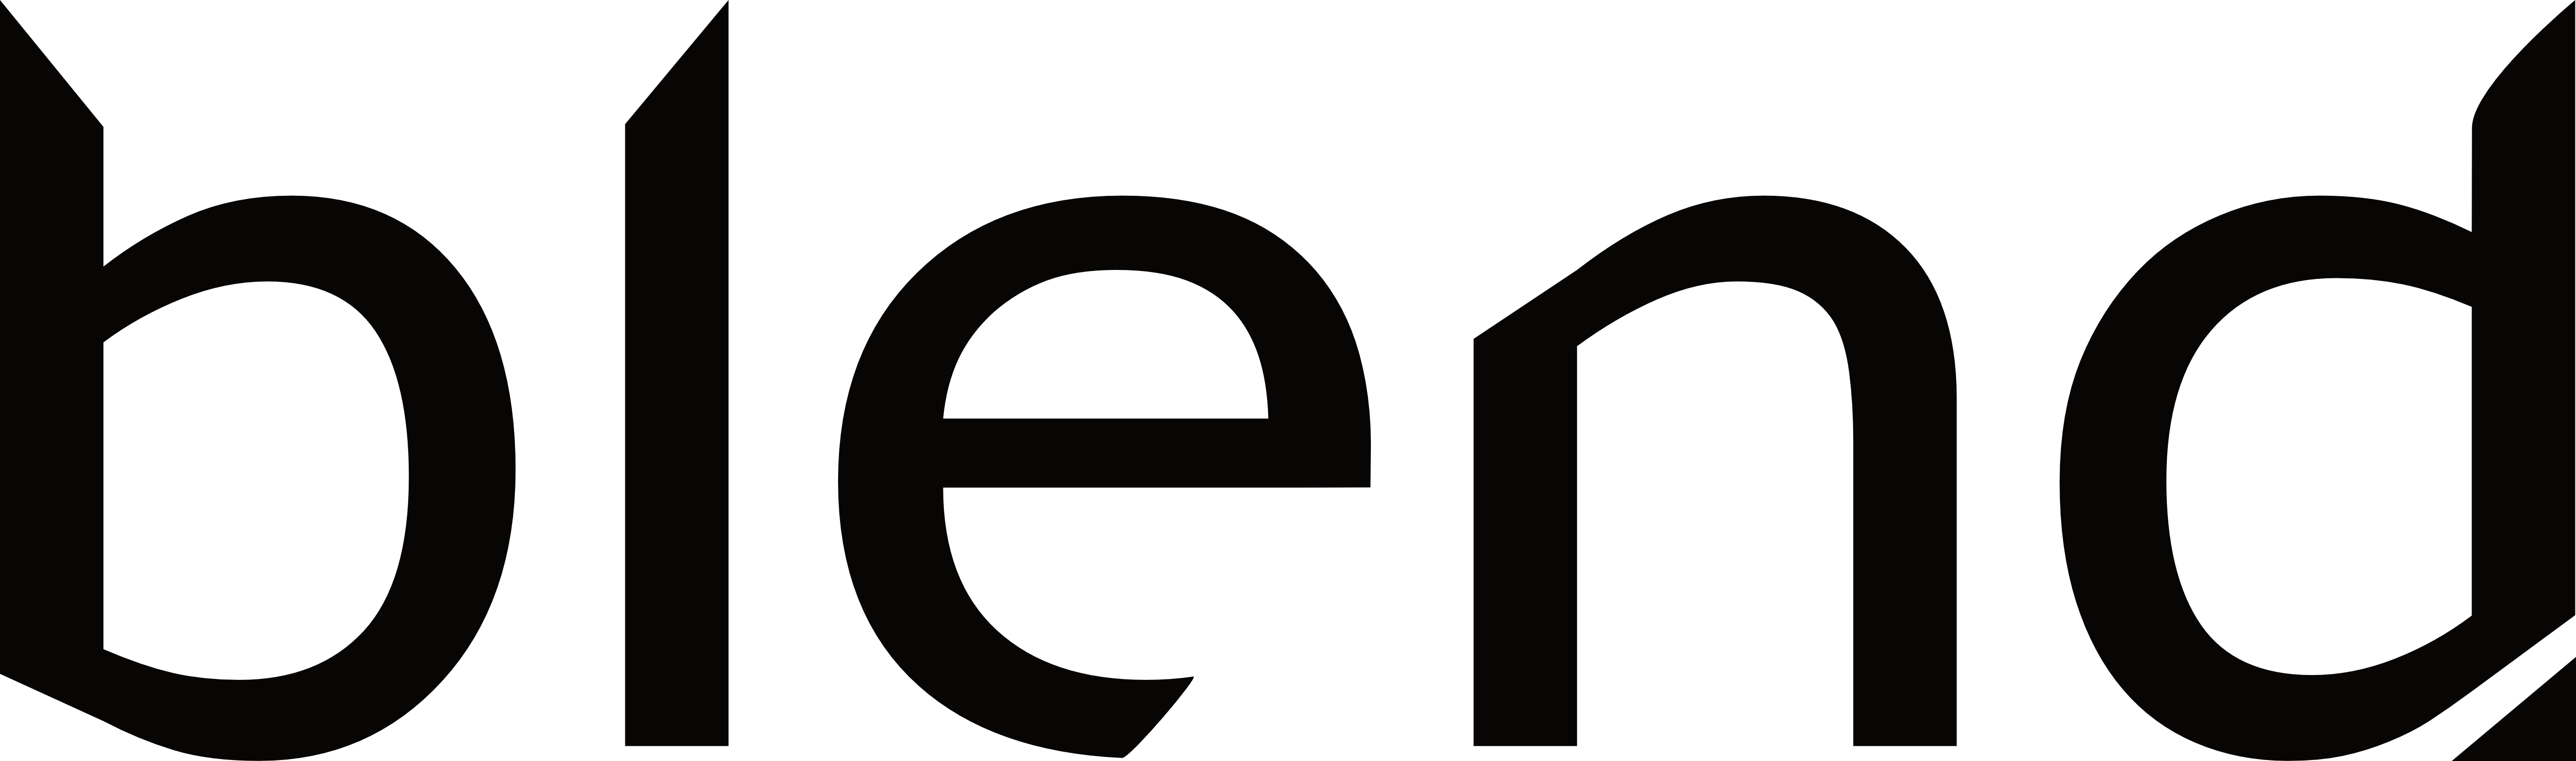 Disainiagentuuri-blend-logo